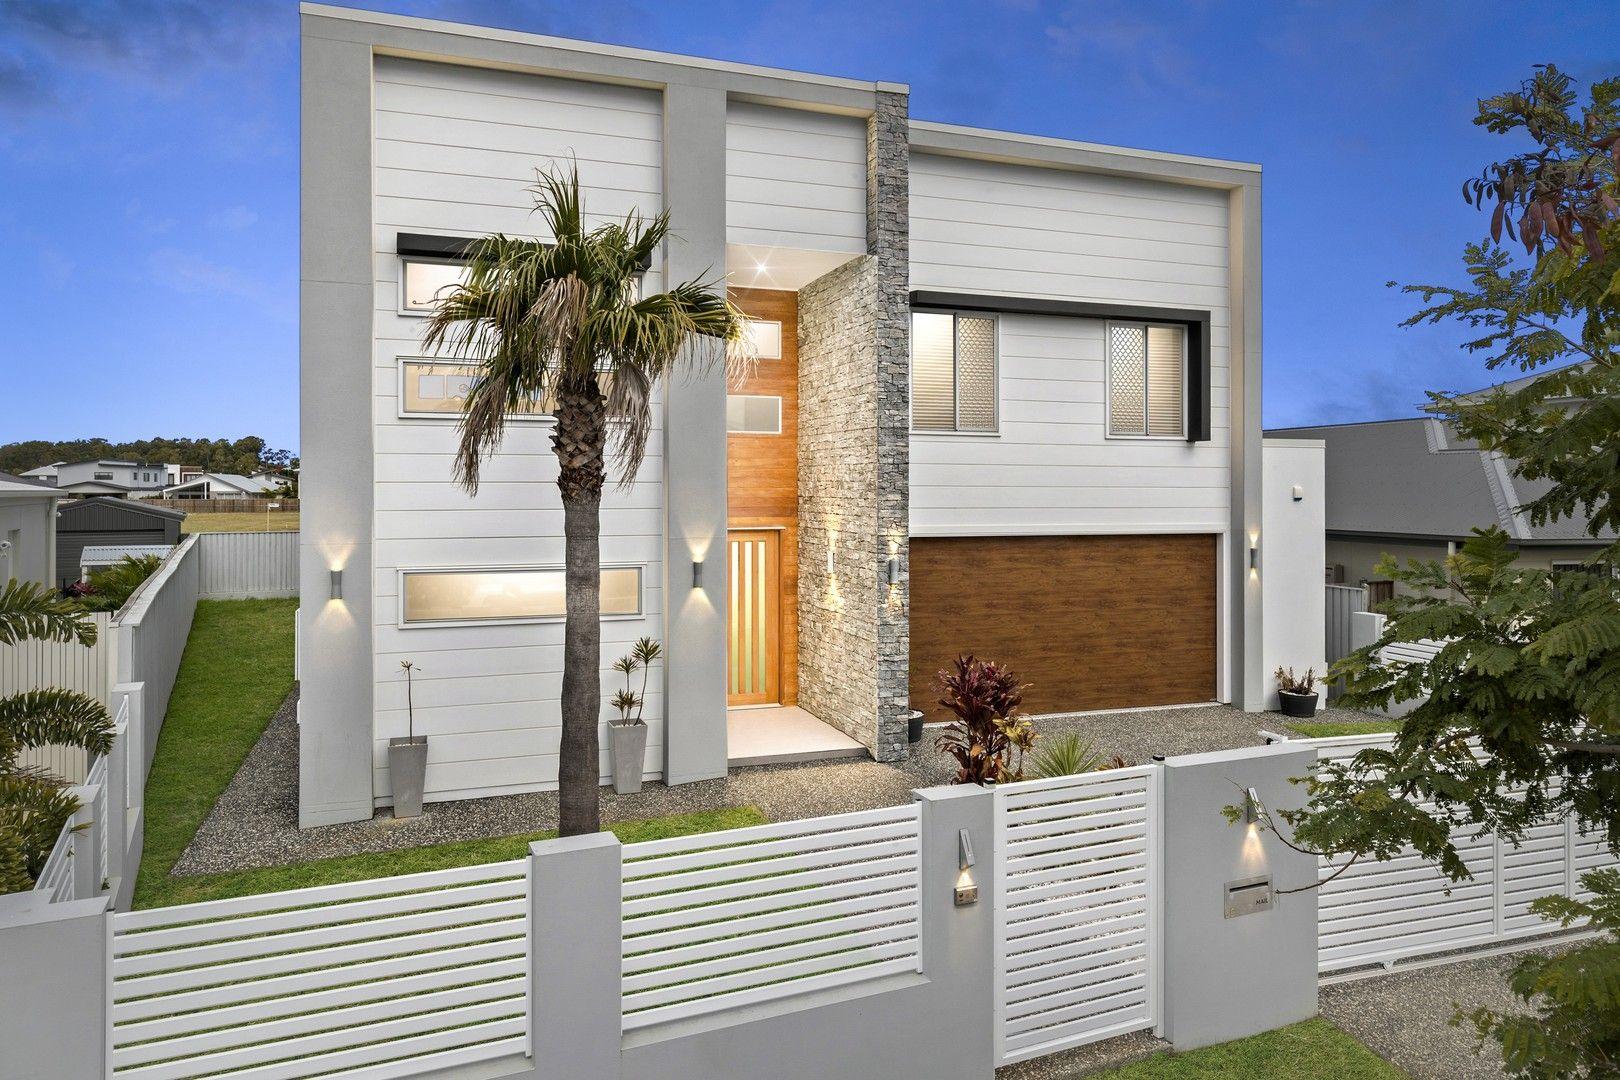 59 Lakeview  Promenade, Newport QLD 4020, Image 0